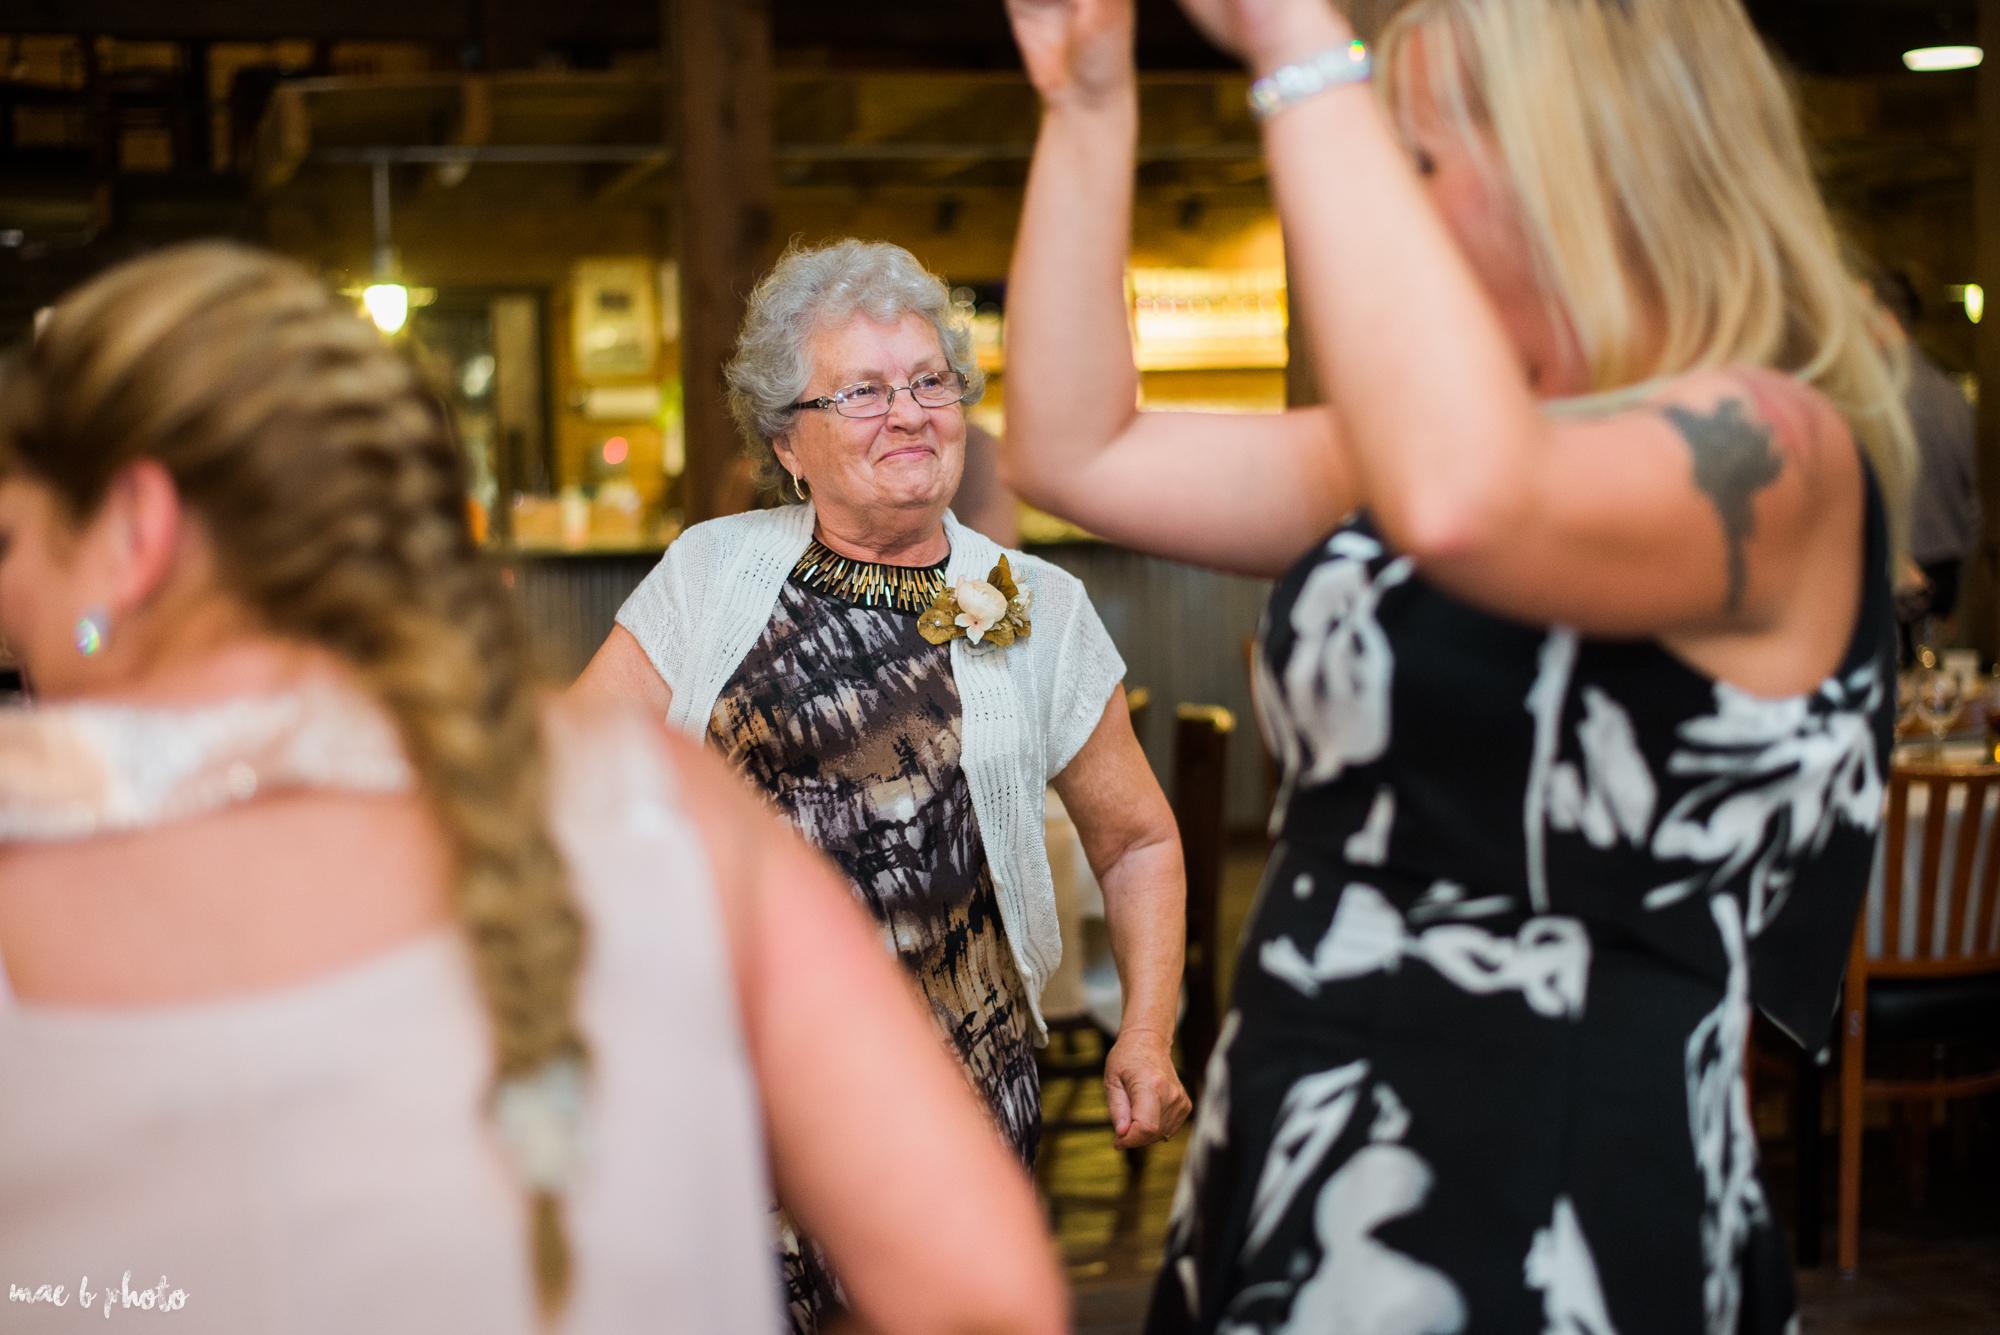 Sarah & Dustin's Rustic Chic Barn Wedding at Hartford Hill Winery in Hartford, Ohio by Mae B Photo-114.jpg